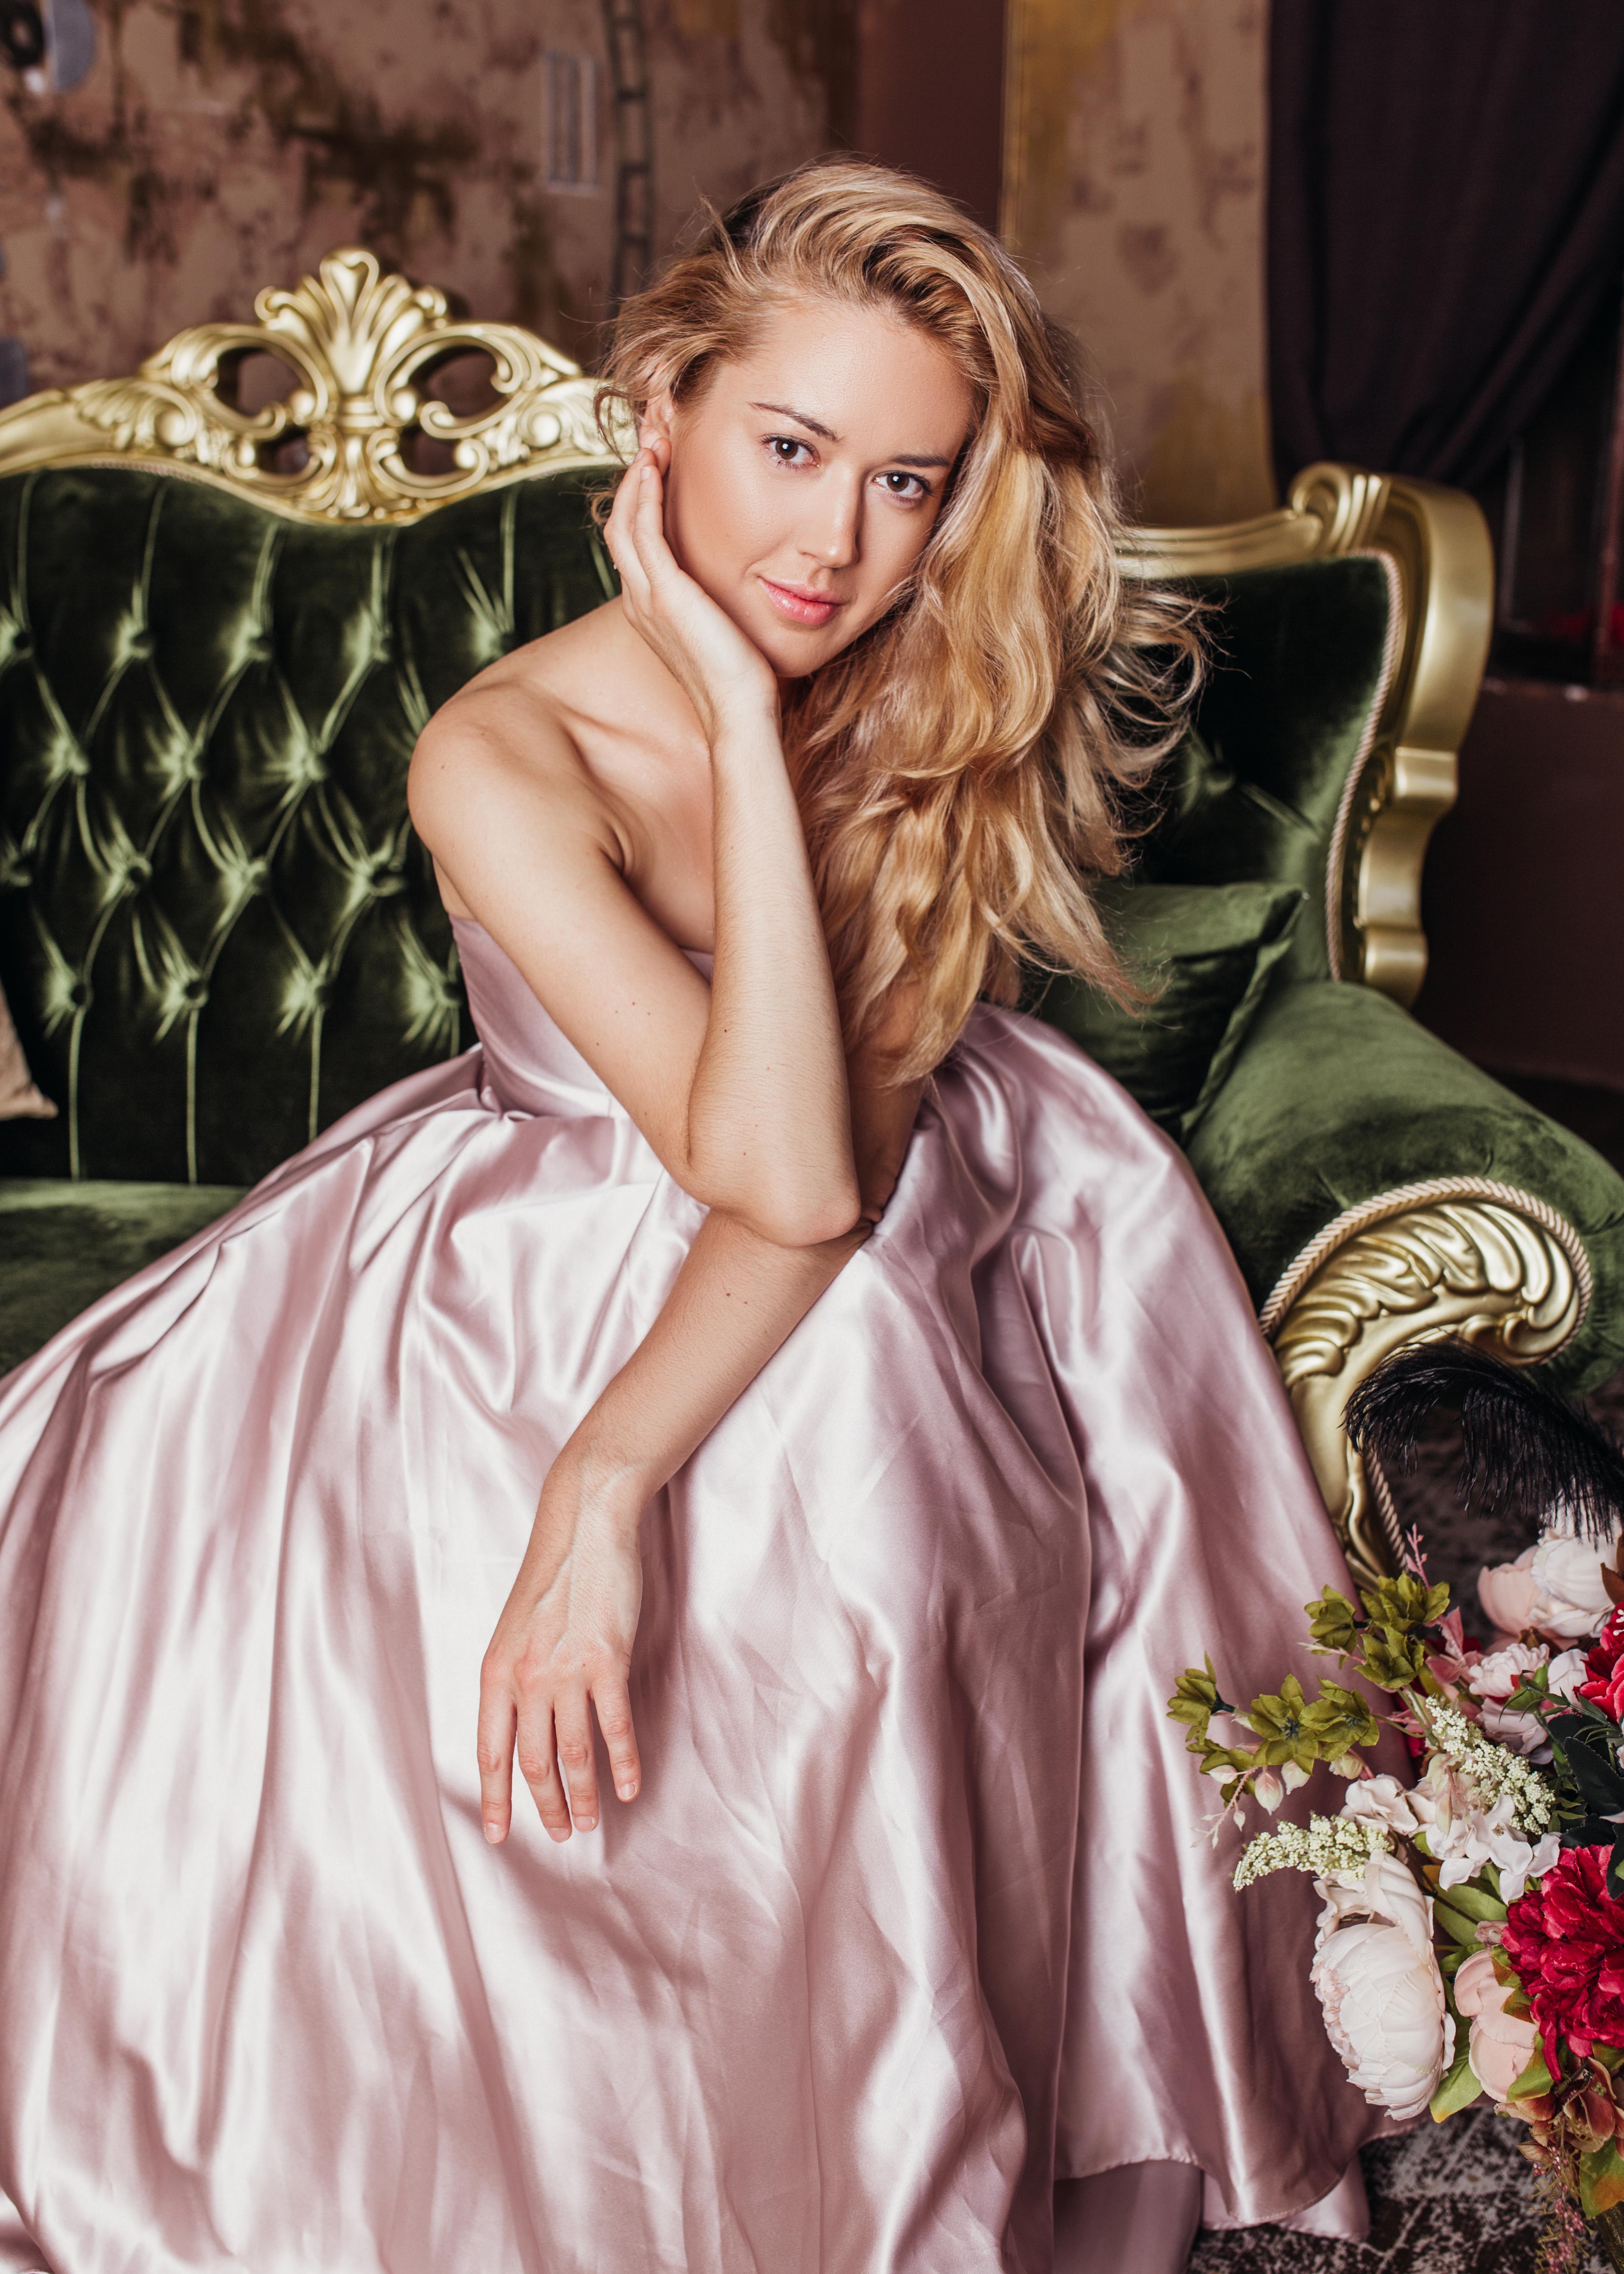 Polina Ushakova. Ornaments : Scriabin, Chopin, Schubert